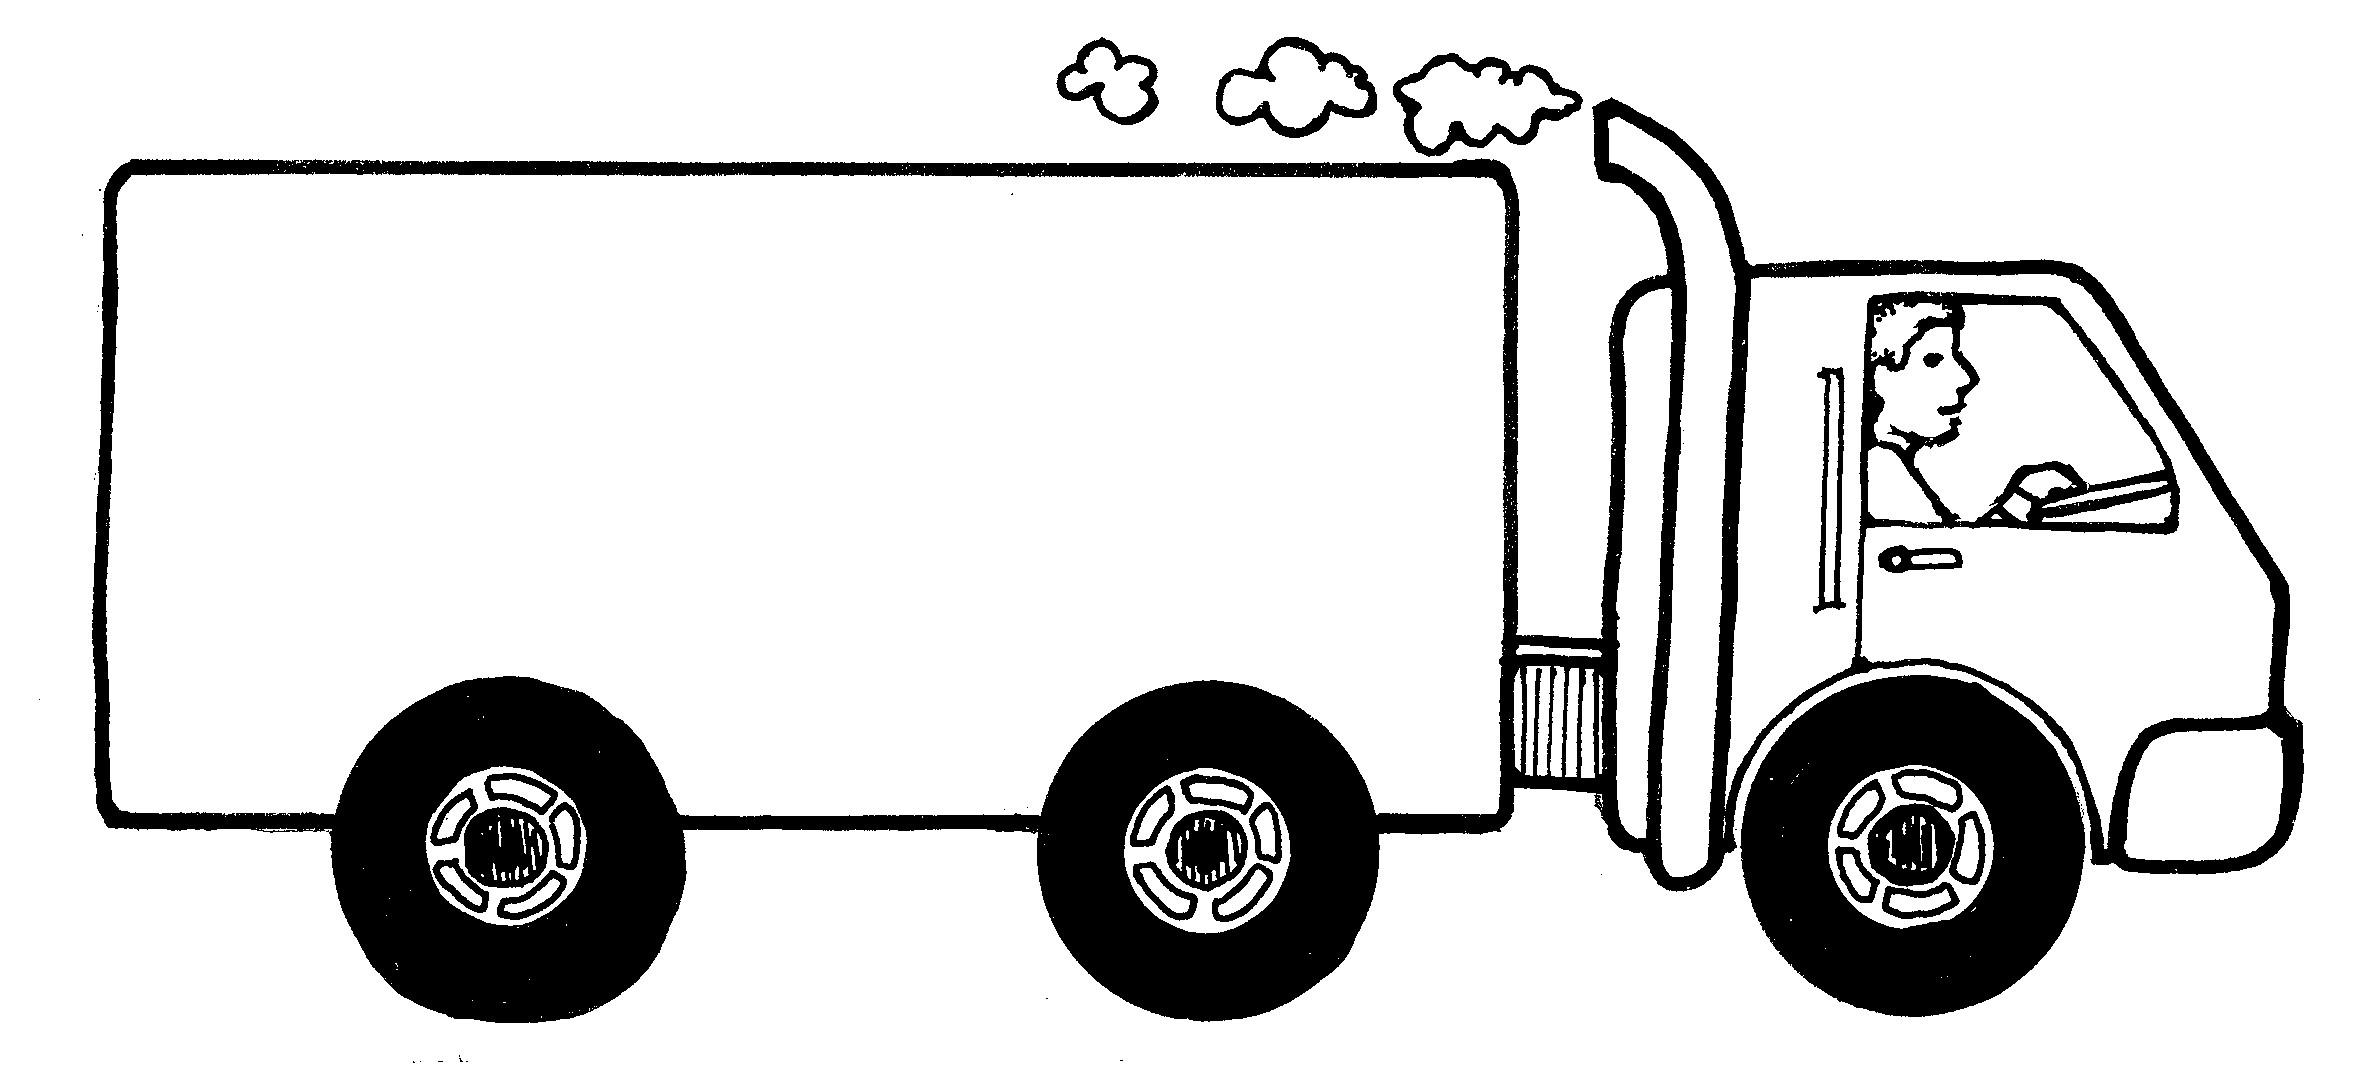 Truck Clipart Clipart-Truck Clipart Clipart-14